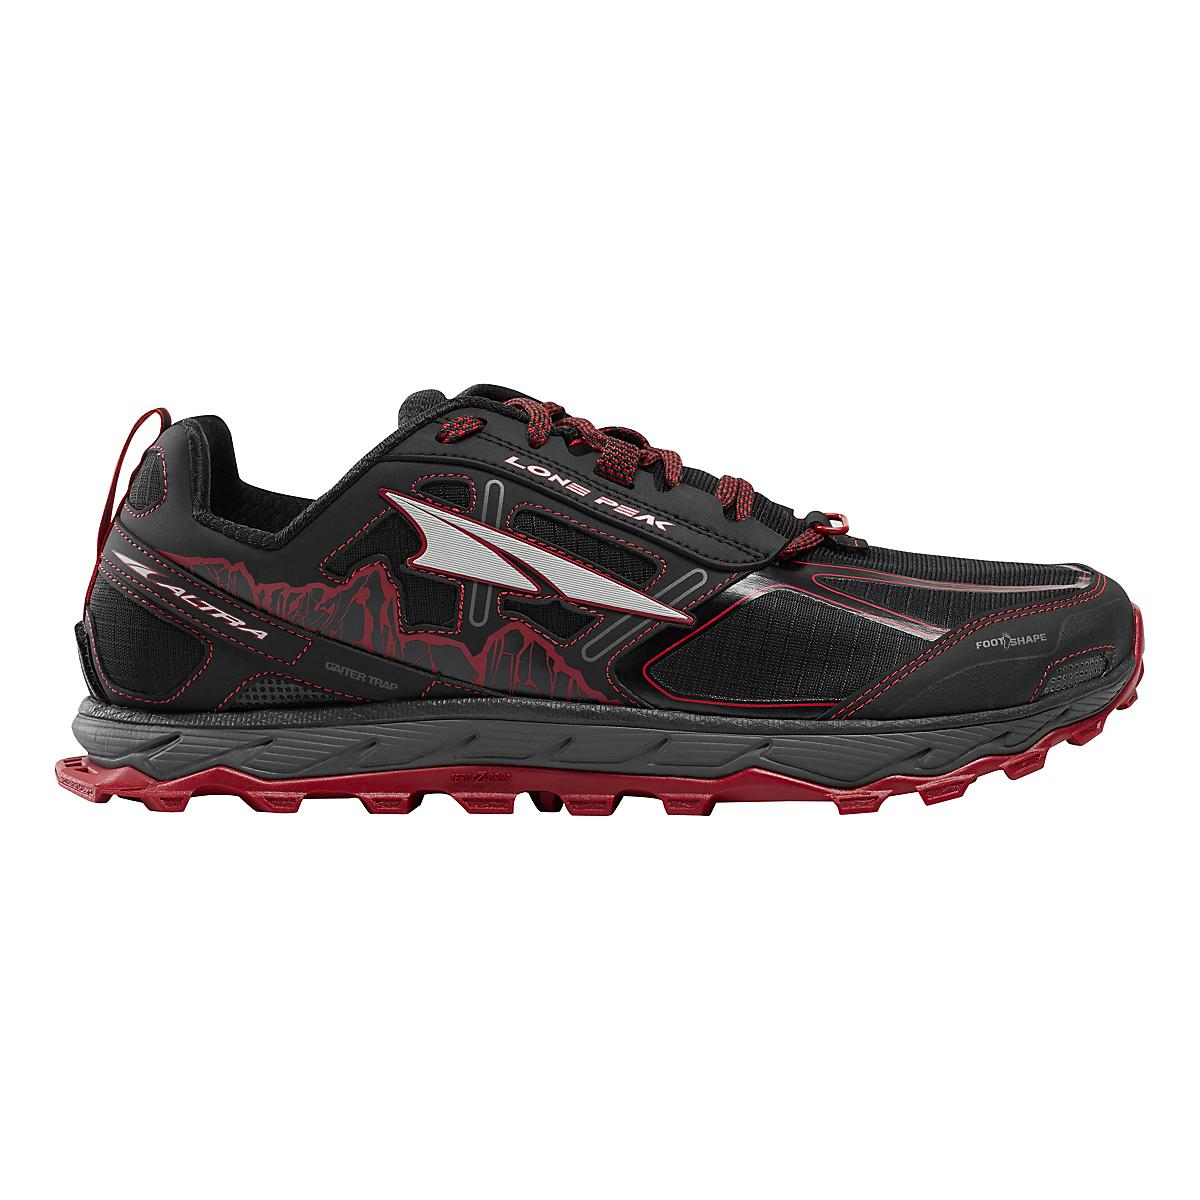 ed19d313052 Mens Altra Lone Peak 4.0 Trail Running Shoe at Road Runner Sports